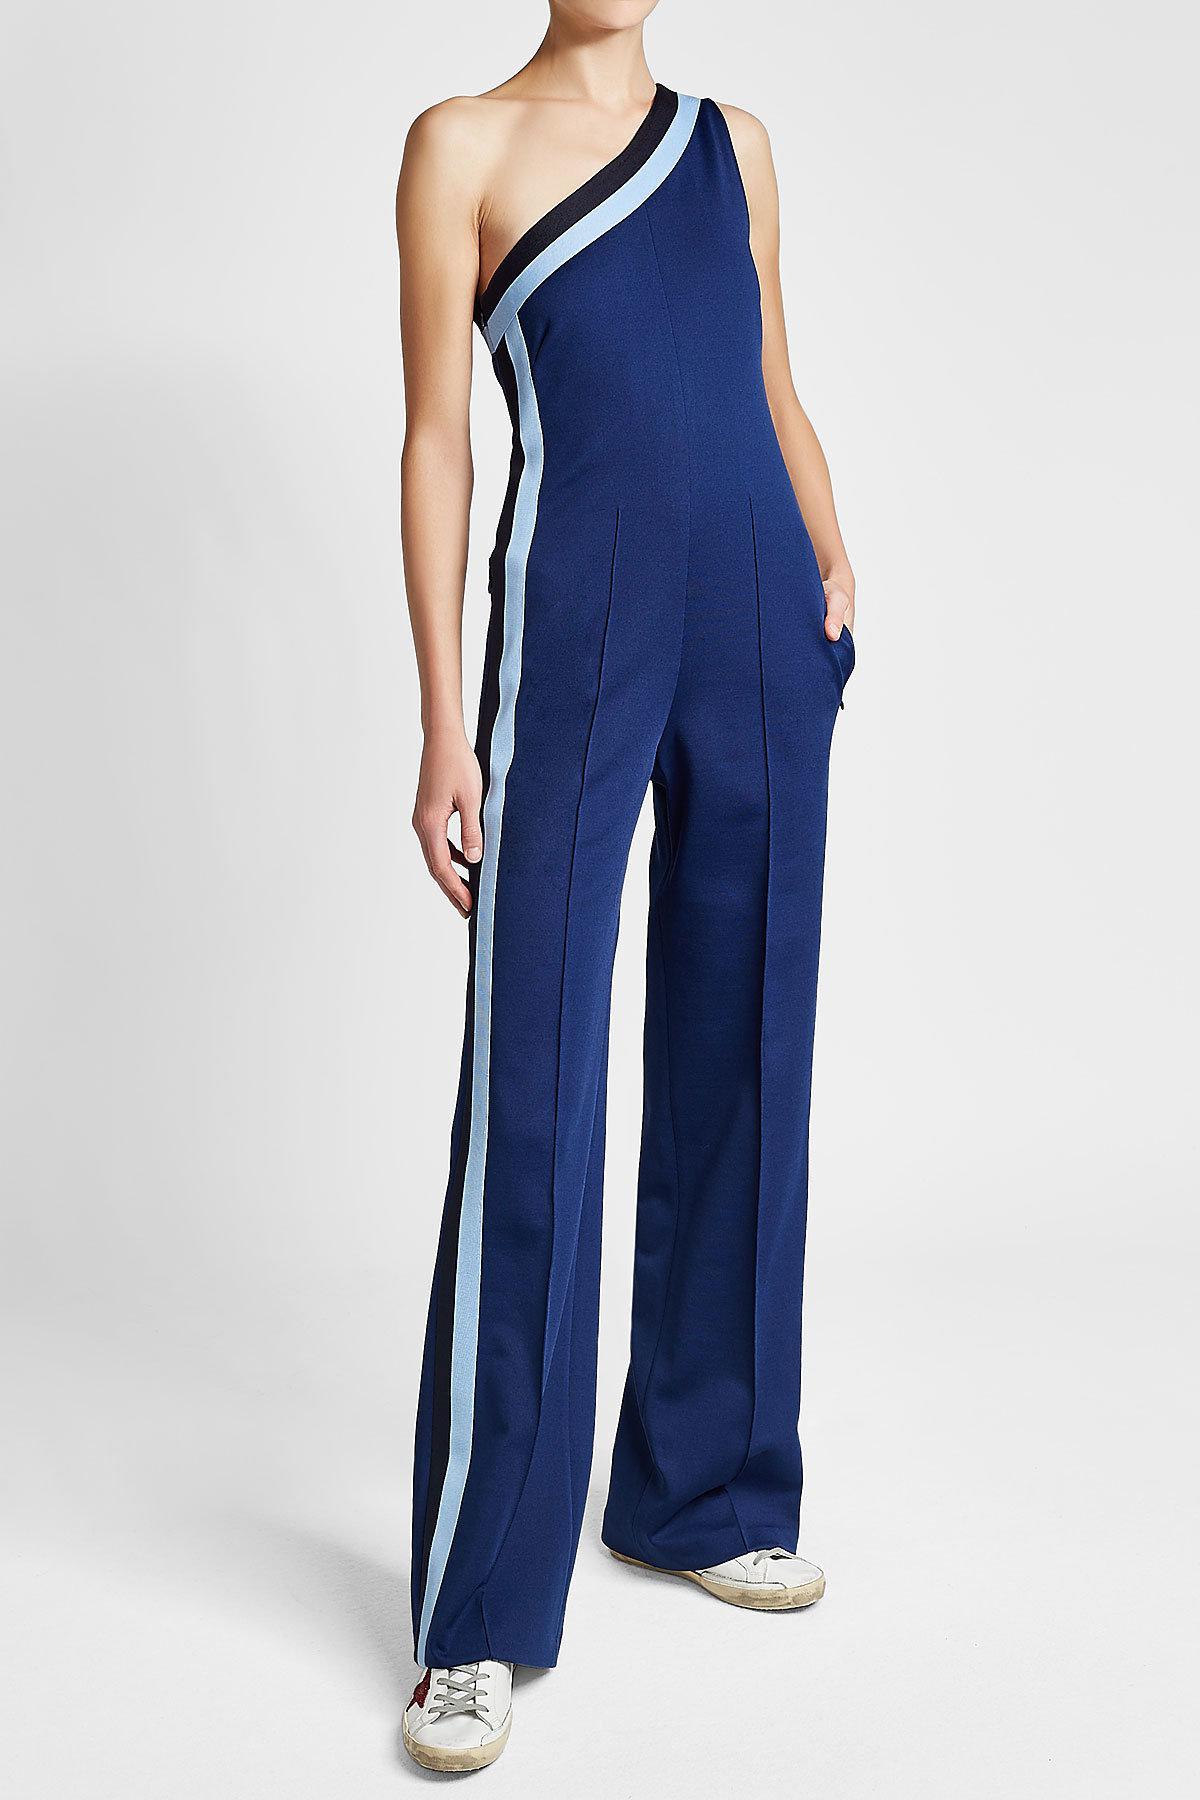 Paloma jumpsuit - Blue Golden Goose Outlet Brand New Unisex 5WhXVQL7C